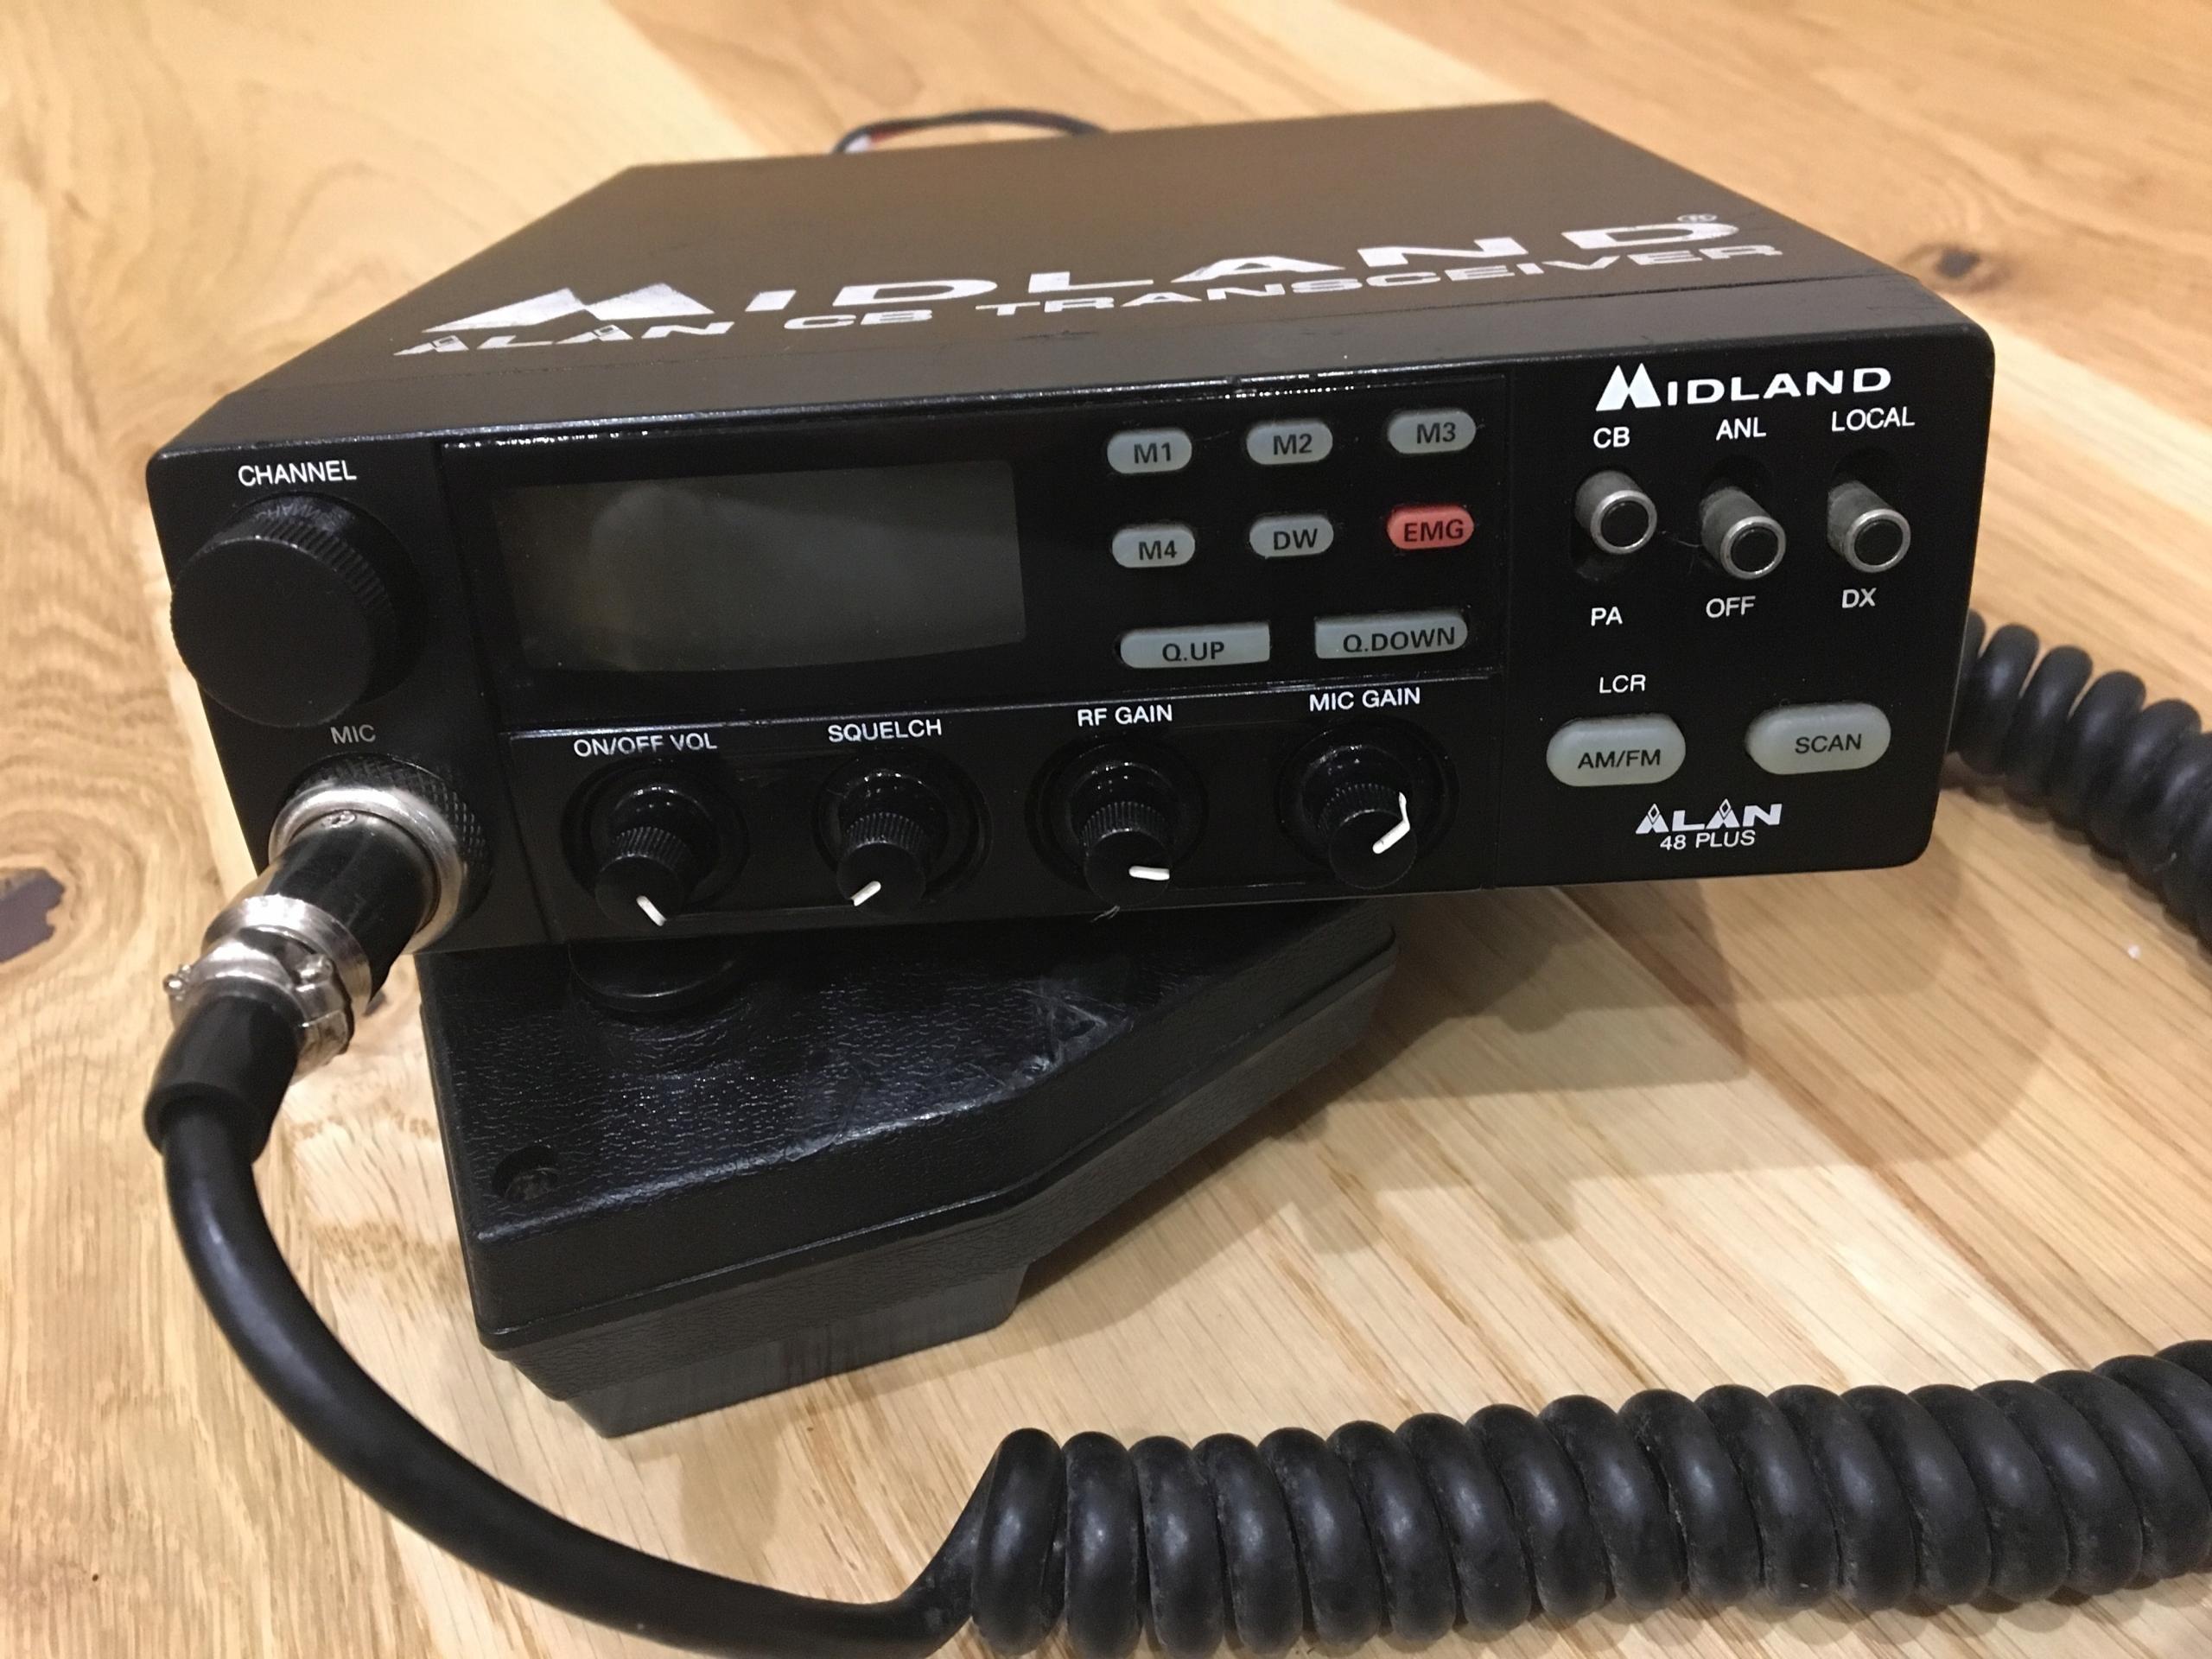 CB RADIO MIDLAND 48 PLUS